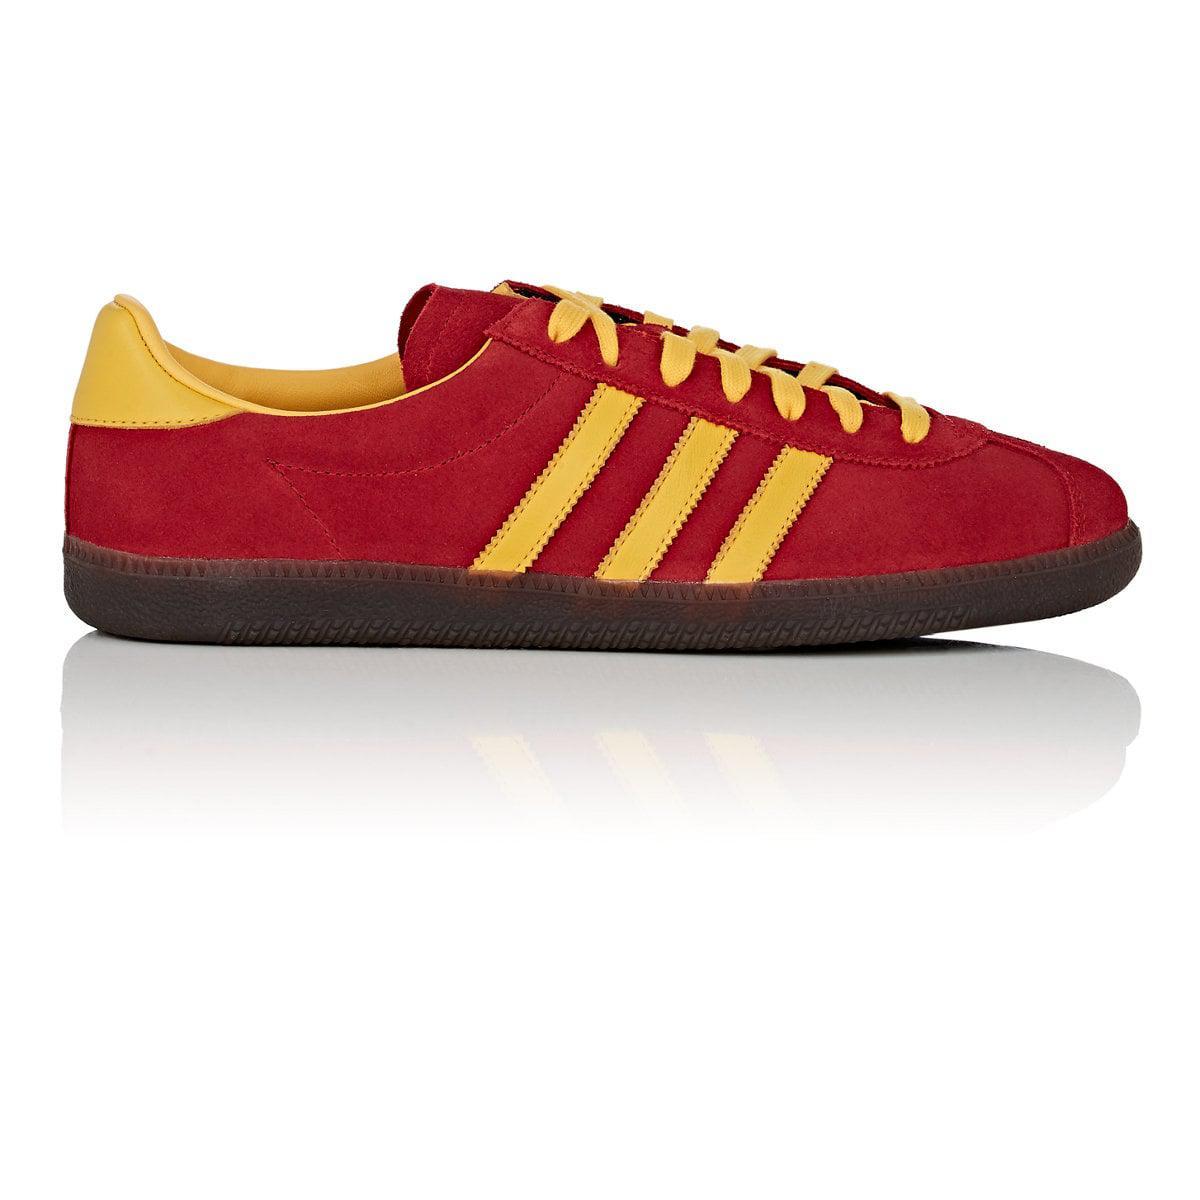 lyst adidas spiritus spzl scarpe in rosso per gli uomini.